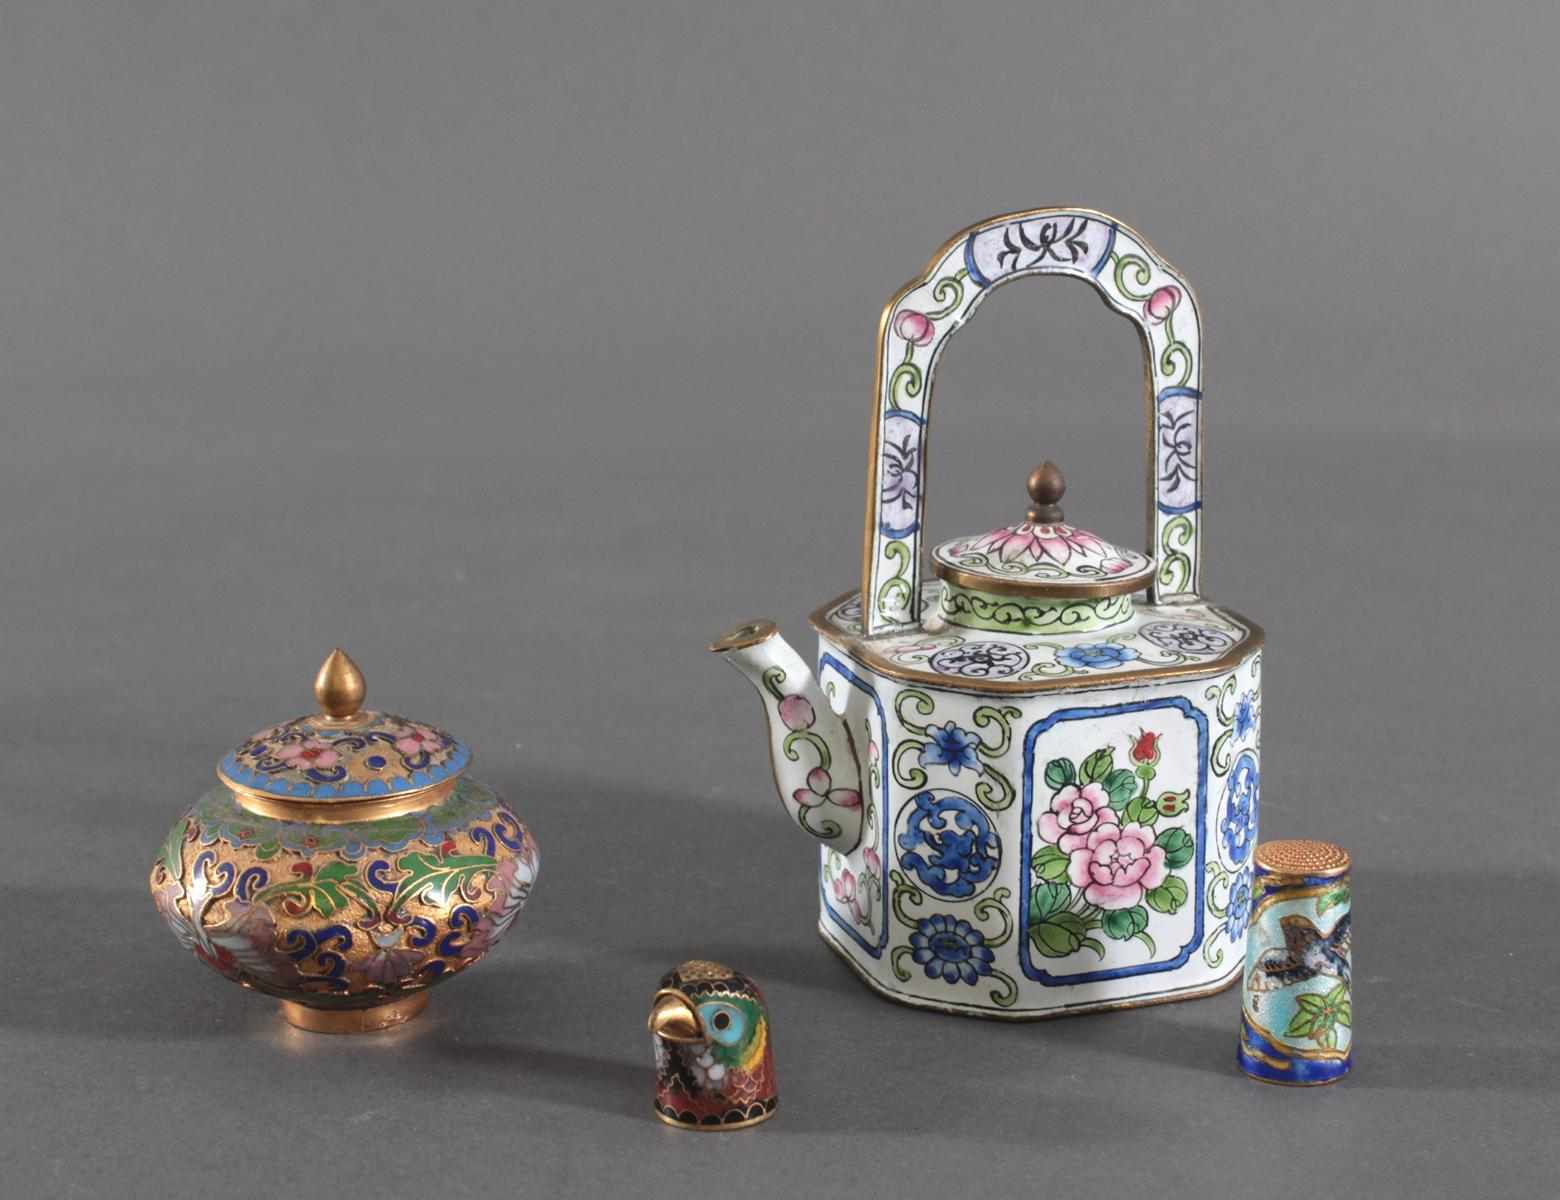 Konvolut Miniatur-Objekte, China 20. Jahrhundert